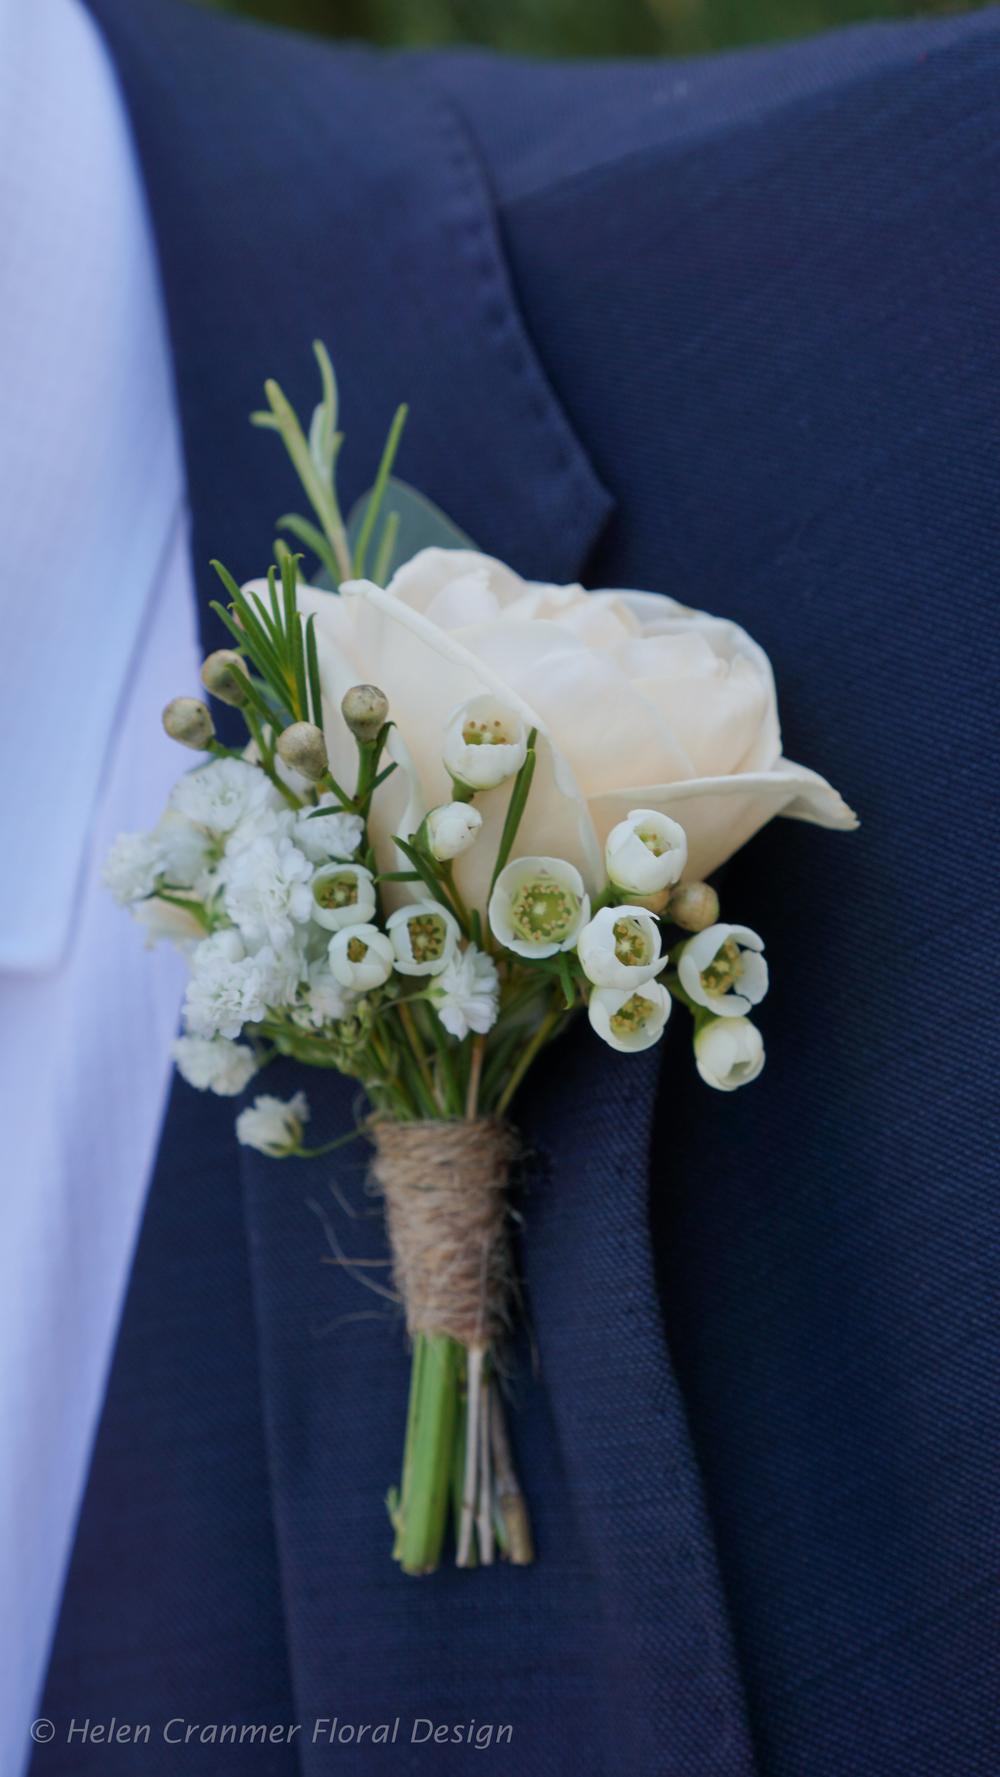 September flowers weddings (29 of 40).jpg